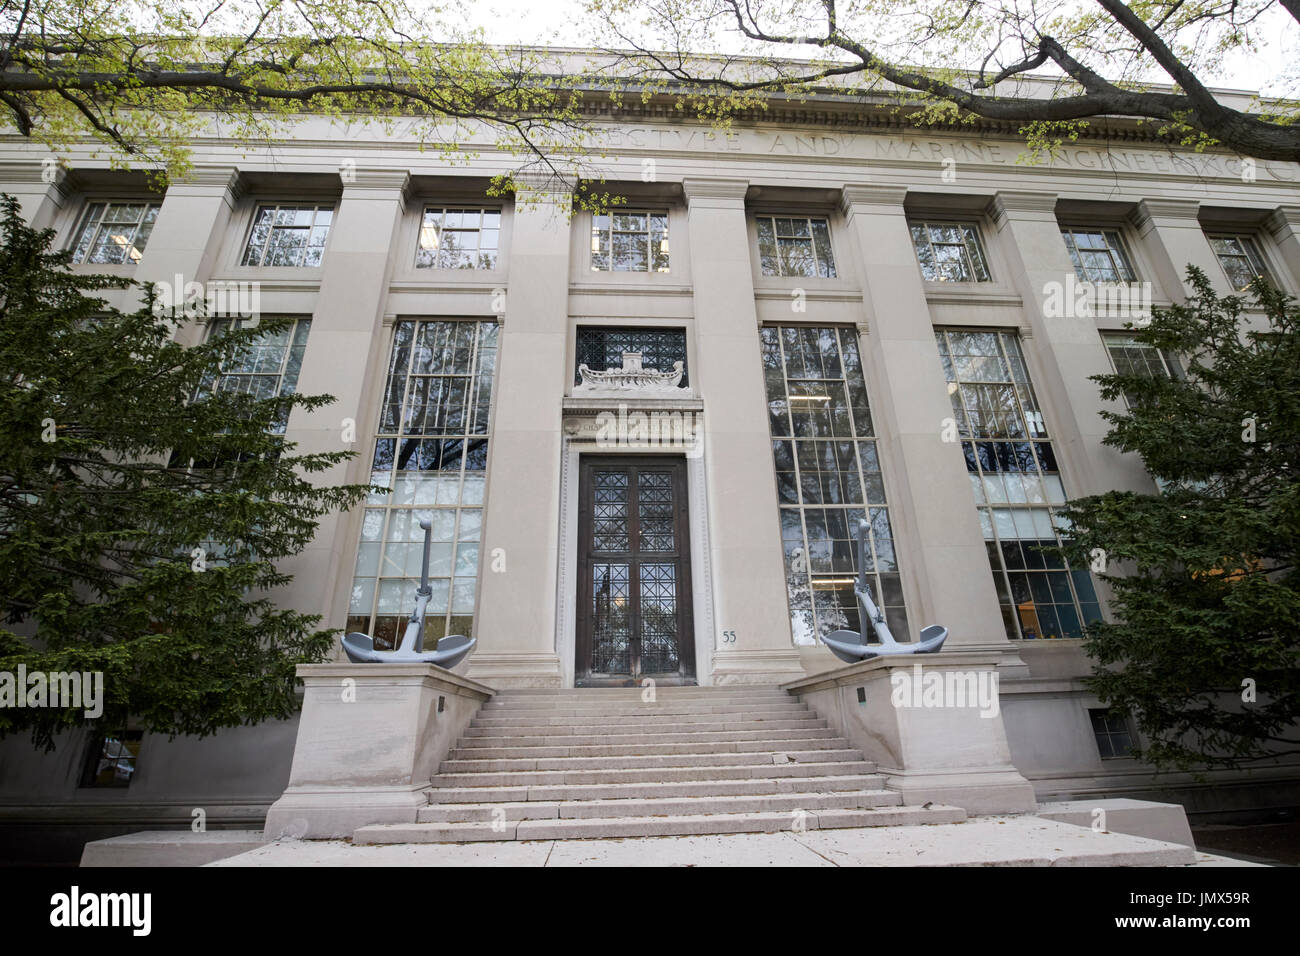 Pratt School Of Naval Architecture And Marine Engineering MIT Massachusetts Institute Technology Boston USA